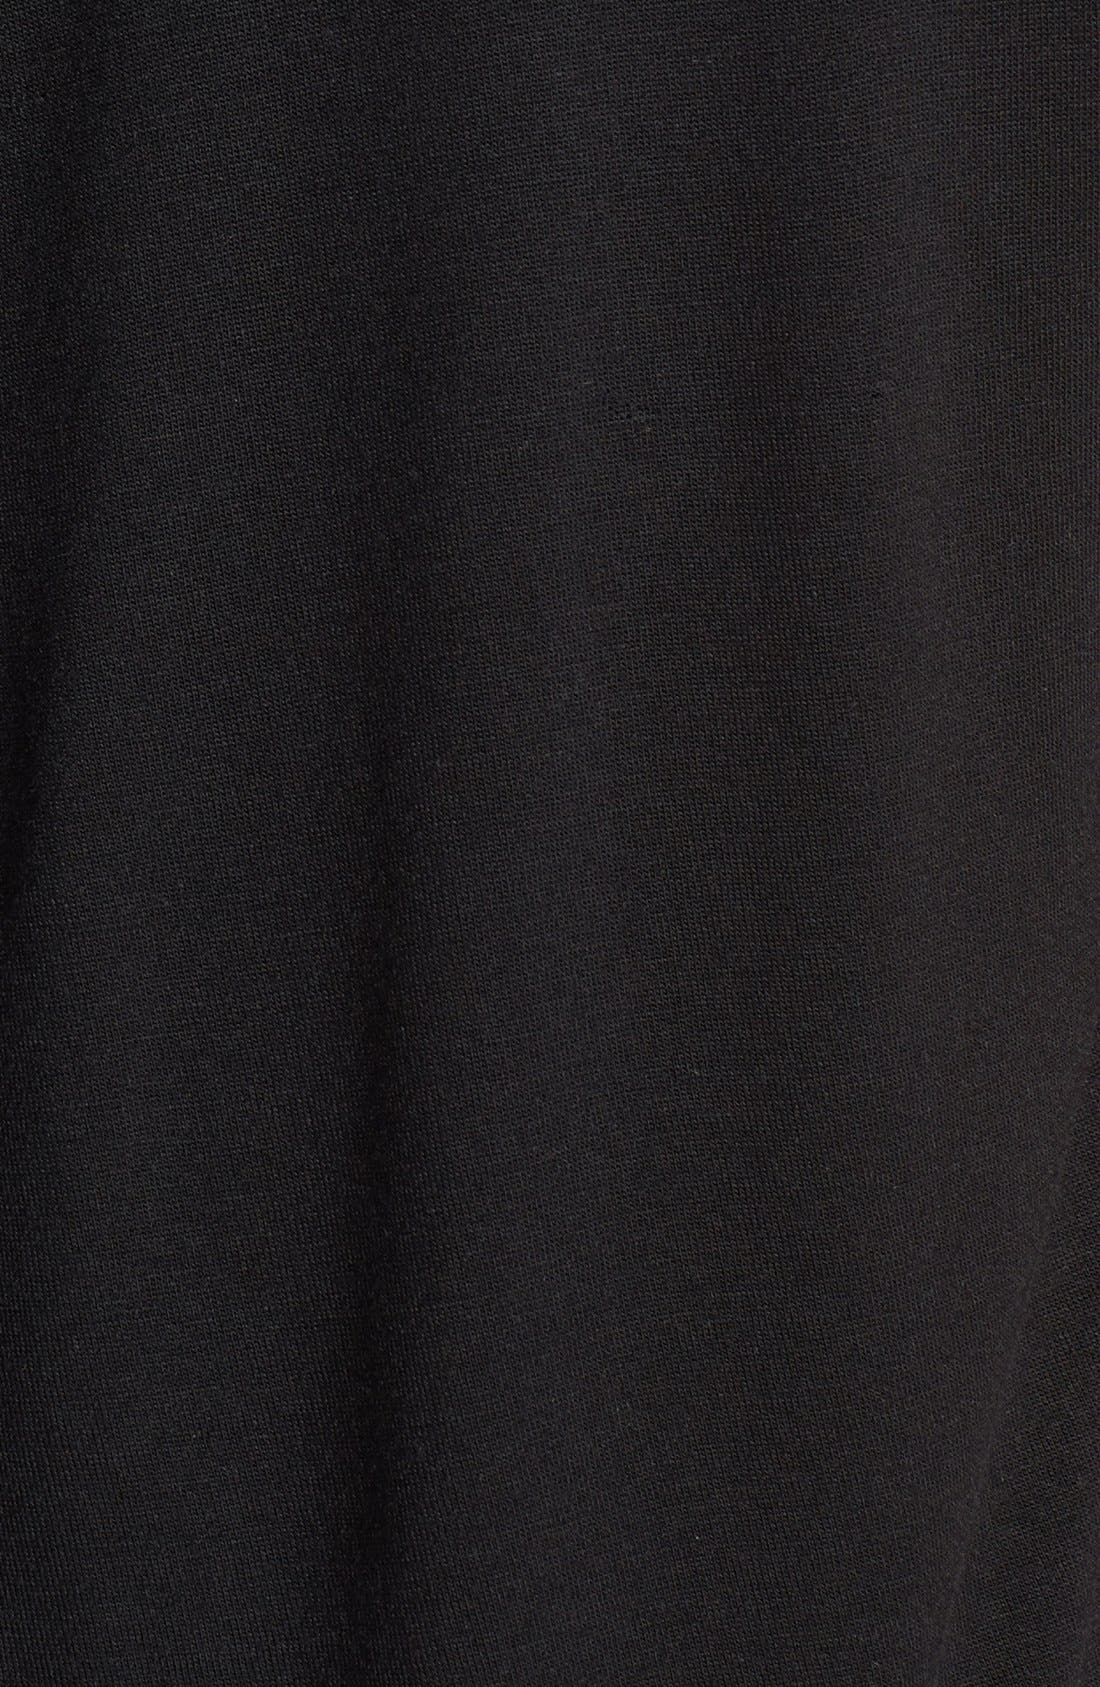 Alternate Image 3  - Kische Embellished Collar Mixed Media Tee (Plus Size)